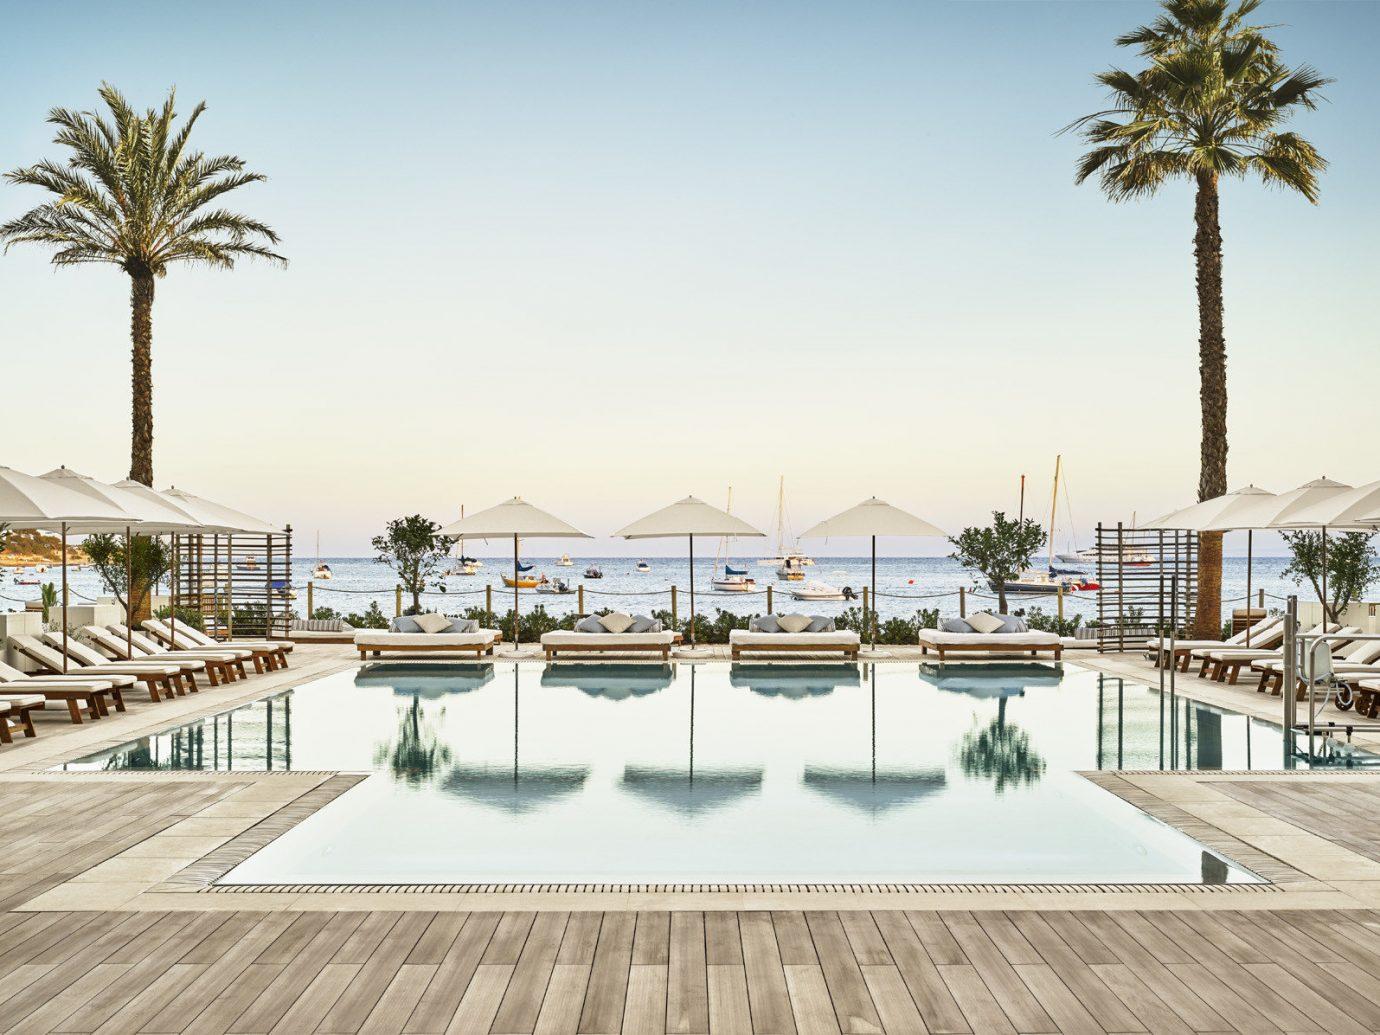 europe Trip Ideas sky outdoor Resort swimming pool vacation palm tree arecales leisure hotel estate tourism condominium palm area